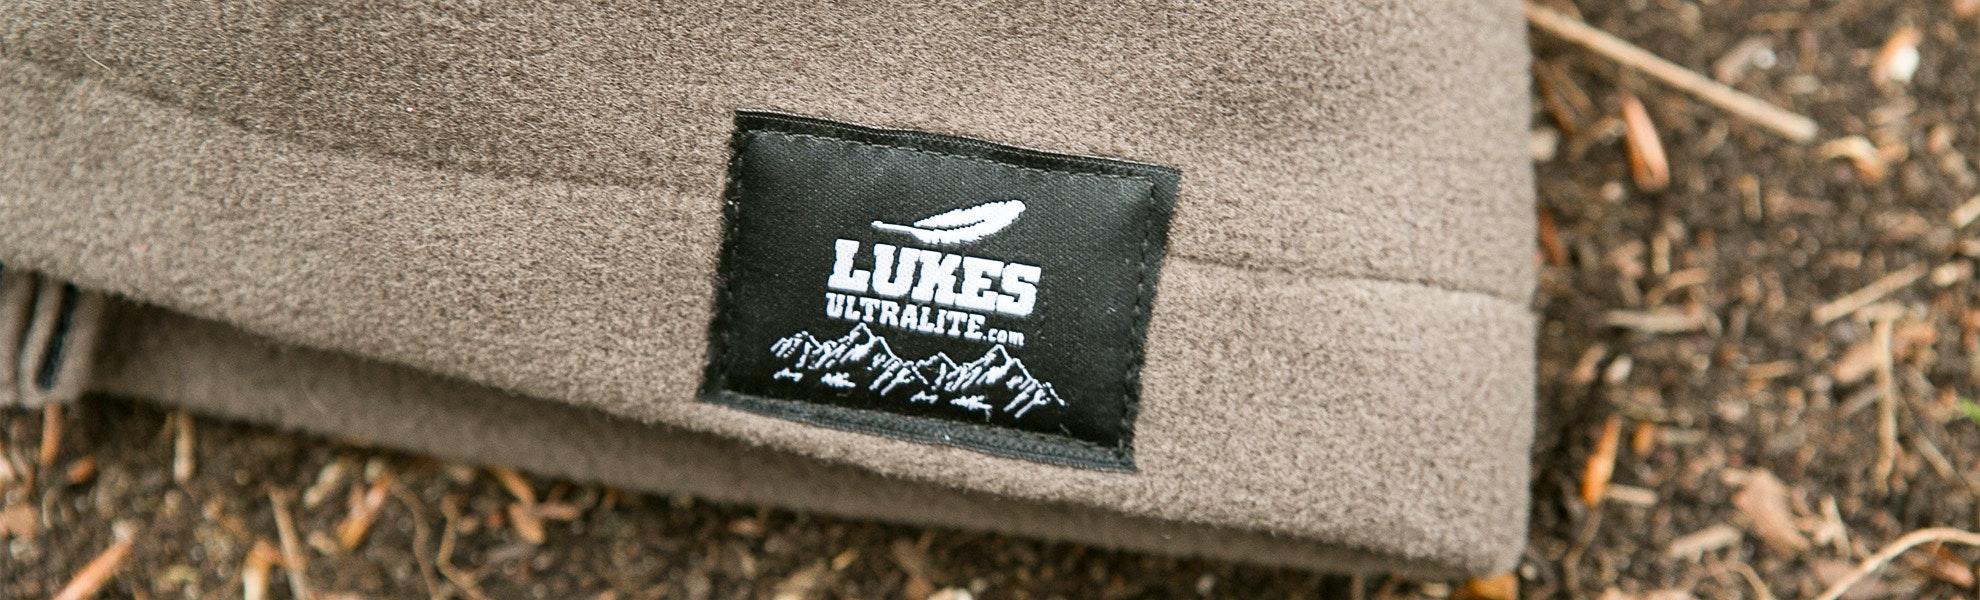 Lukes Ultralite DWR Thermal Beanie